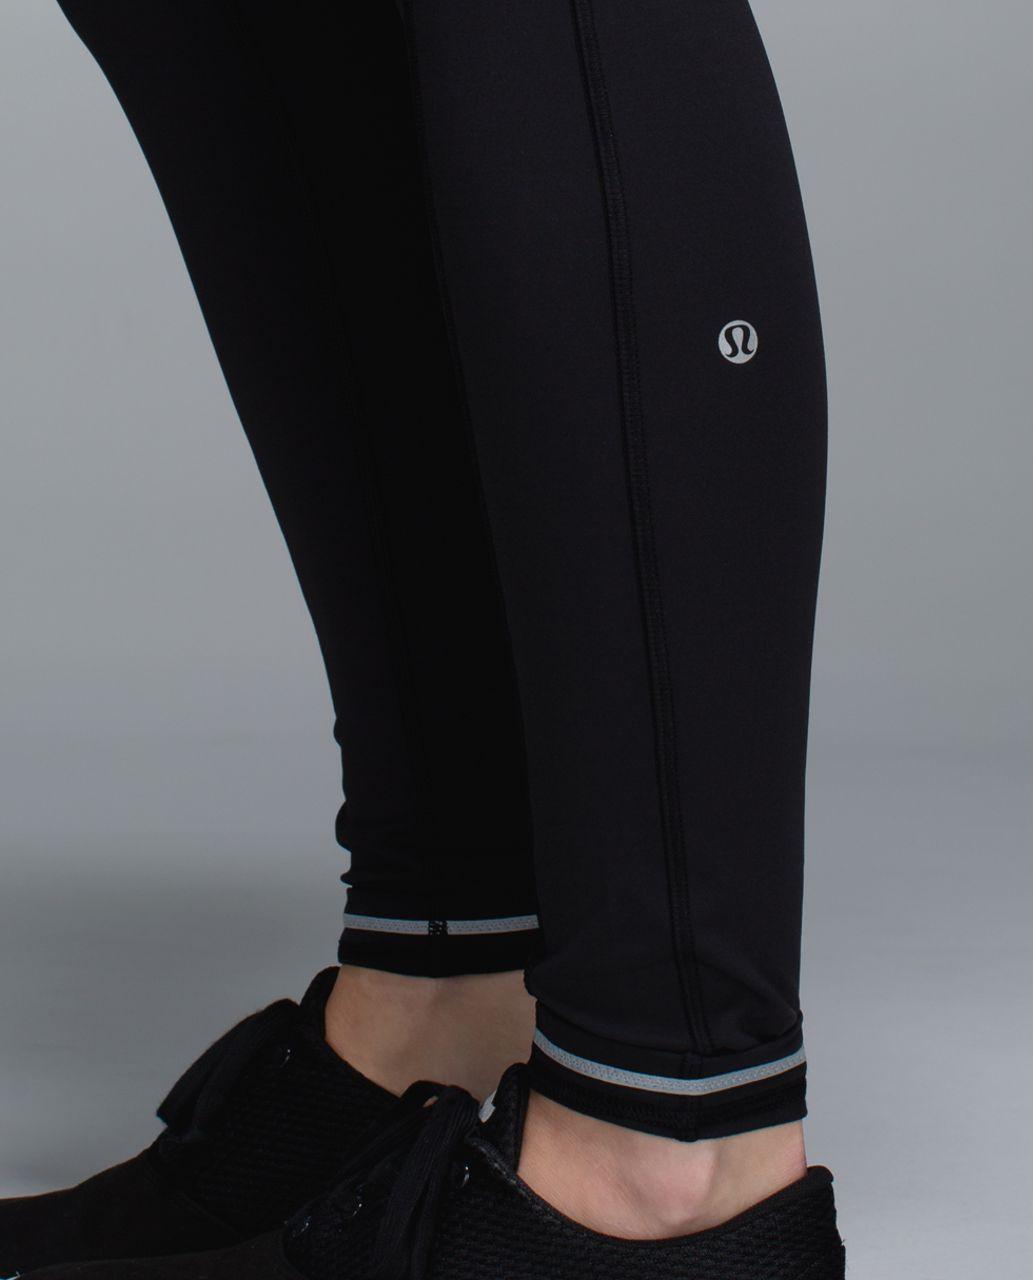 Lululemon Speed Tight ll *Full-On Luxtreme (Brushed) - Black / Fa14 Quilt 26